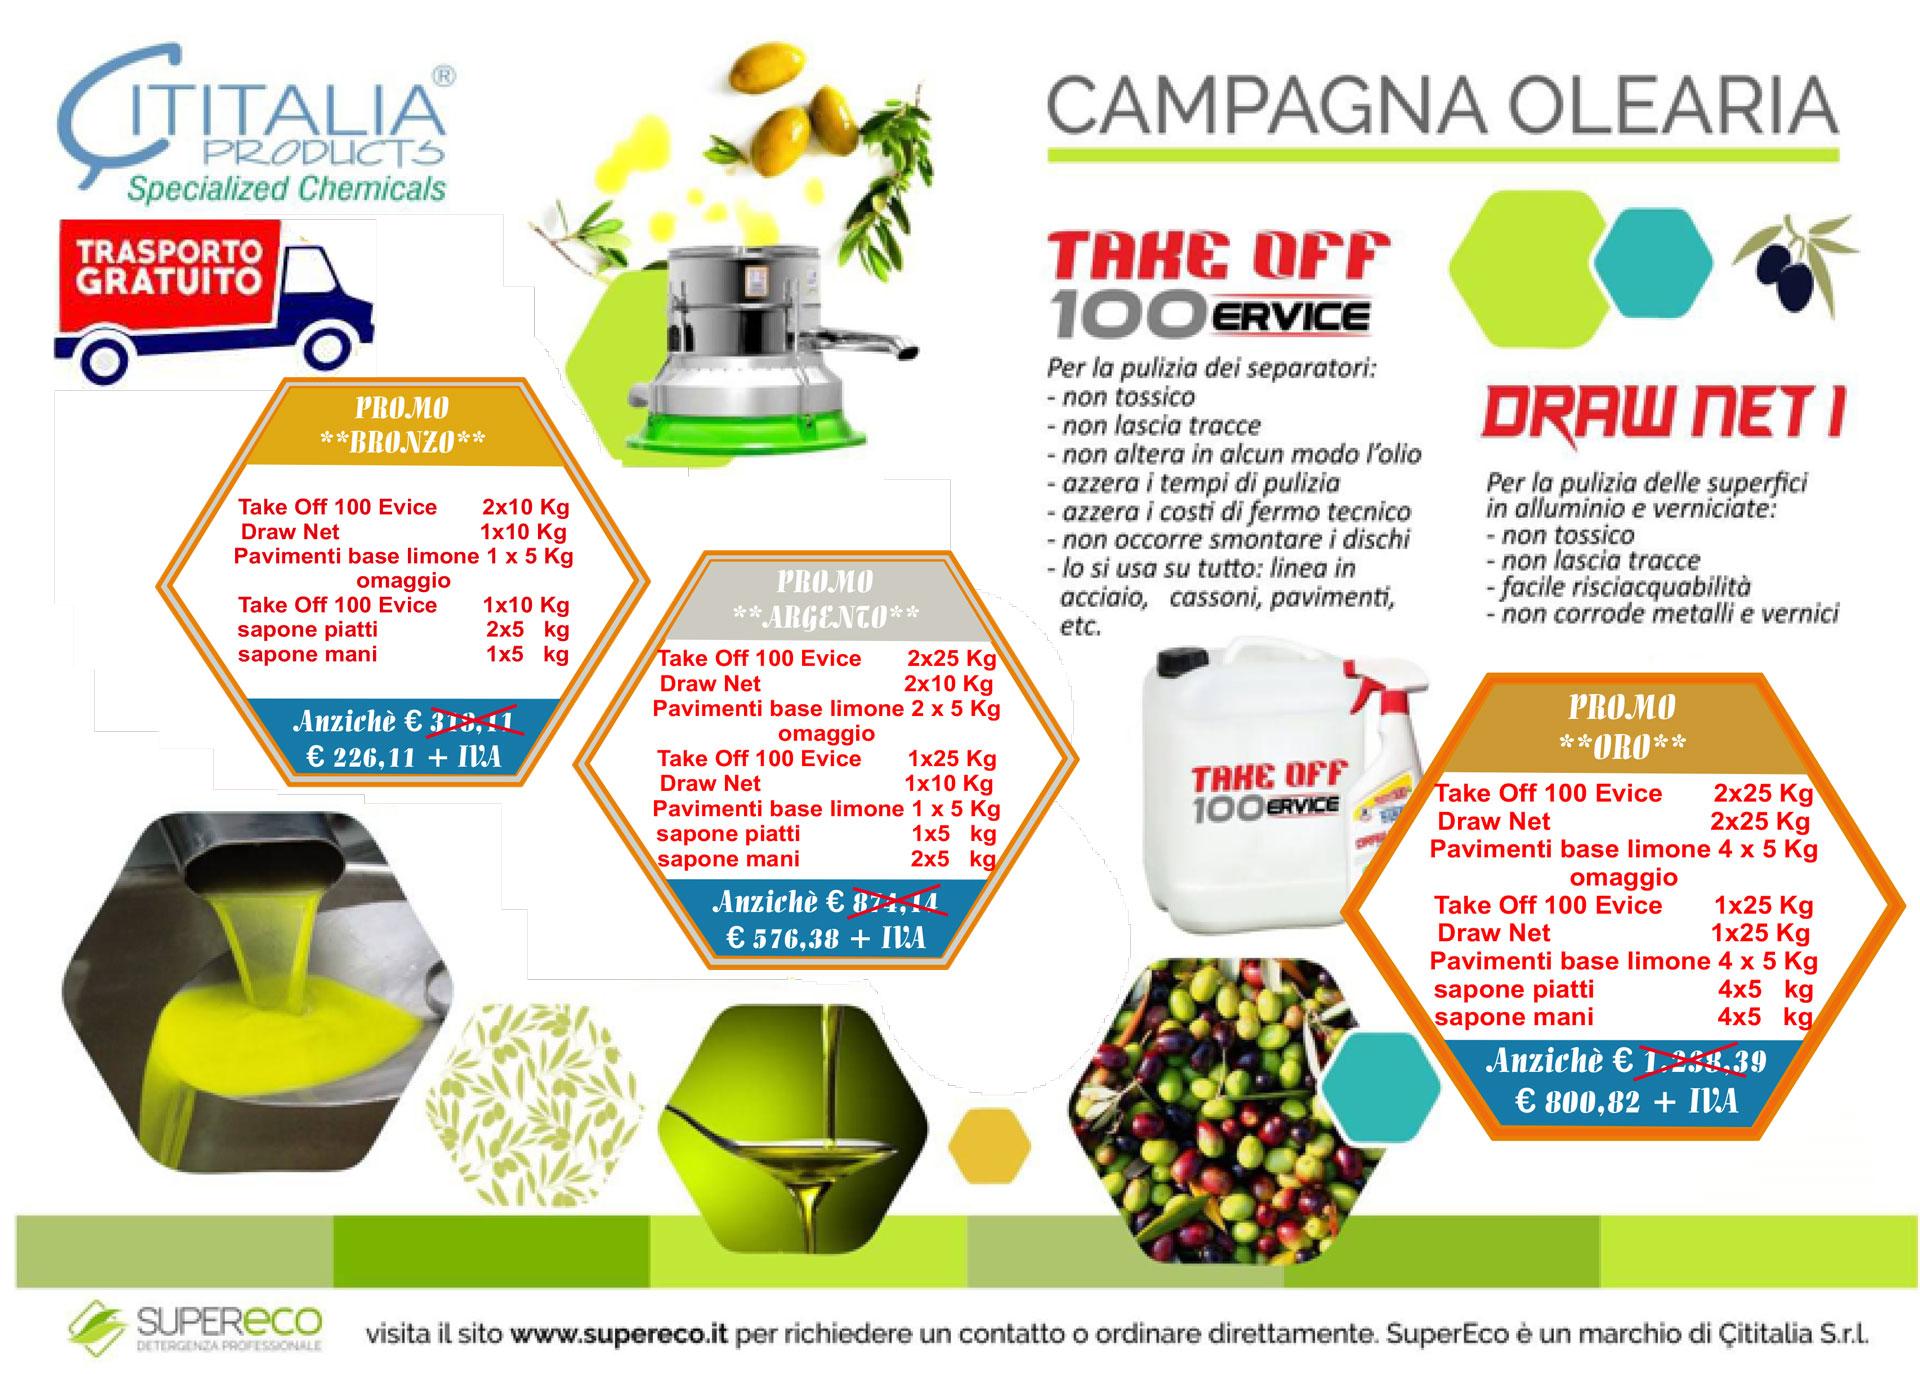 Campagna Olearia 2019